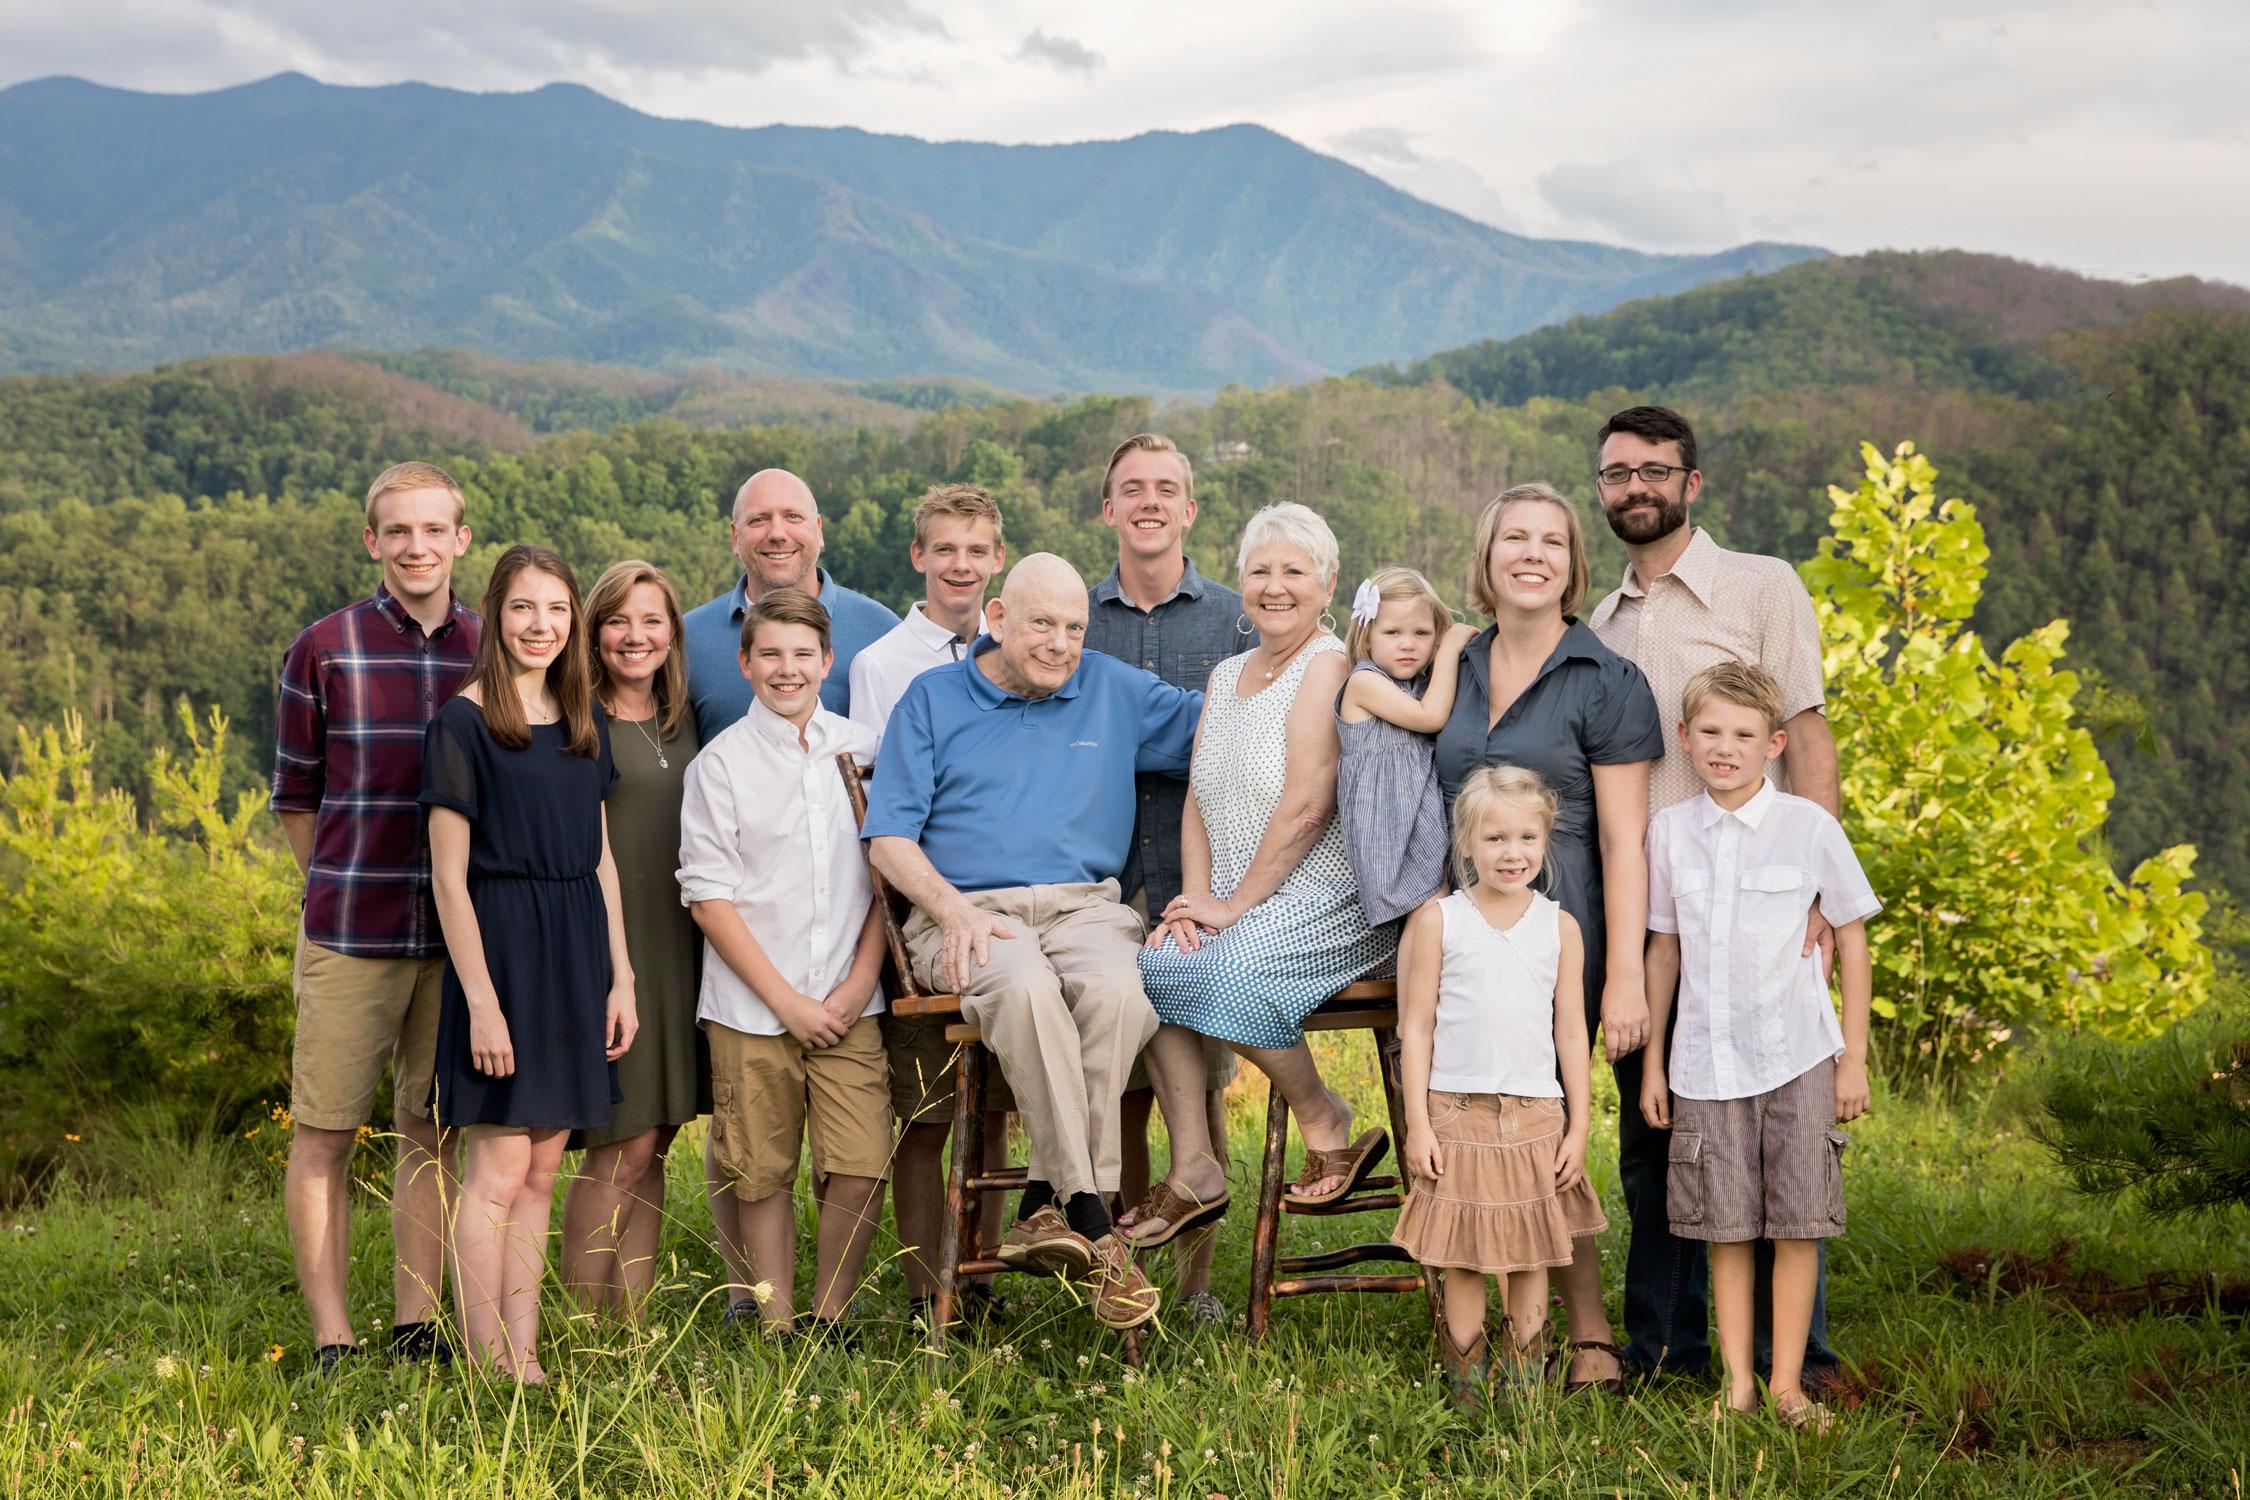 gatlinburg-photographer-family-reunion-picture.jpg